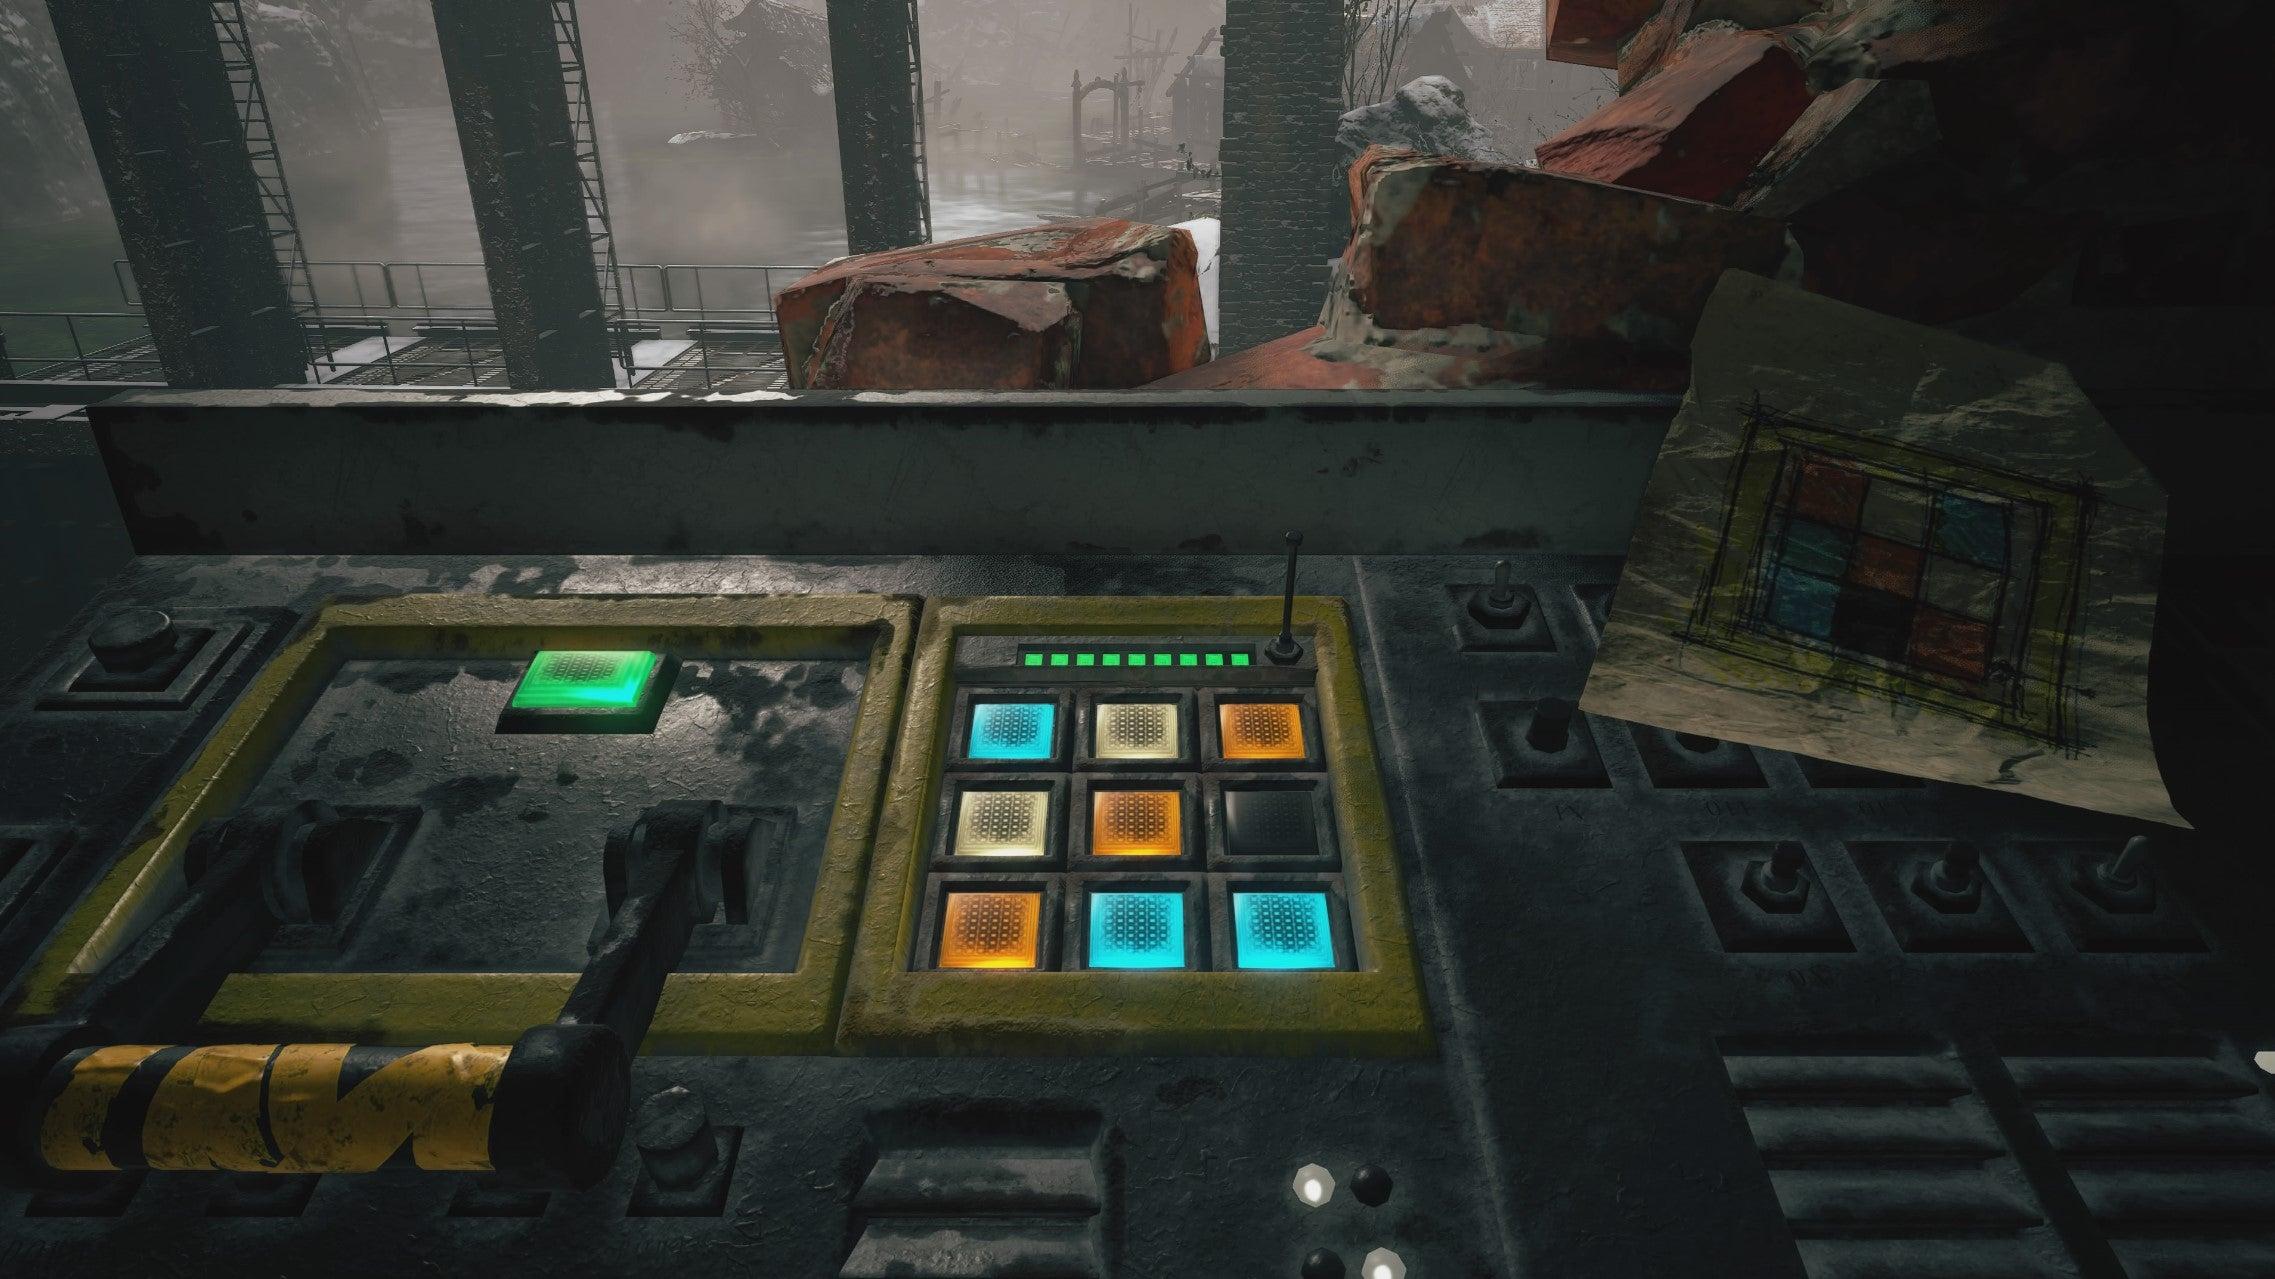 Image for Resident Evil Village Part 13 | Moreau Boss, Sluice Gate puzzle and boat key location